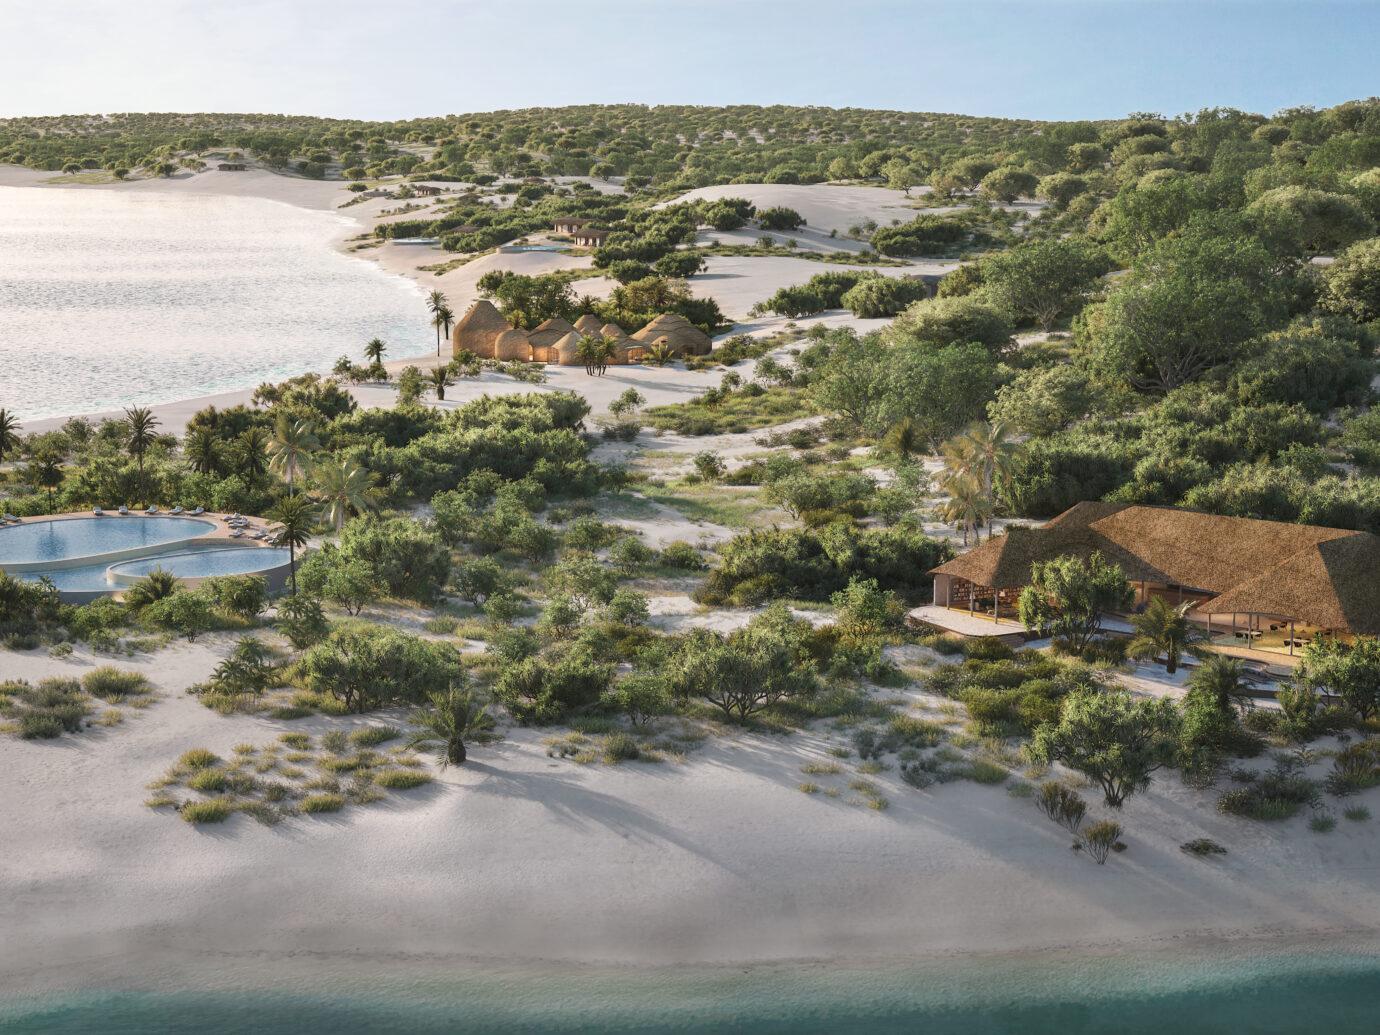 Kisawa Sanctuary, Benguerra Island, Mozambique